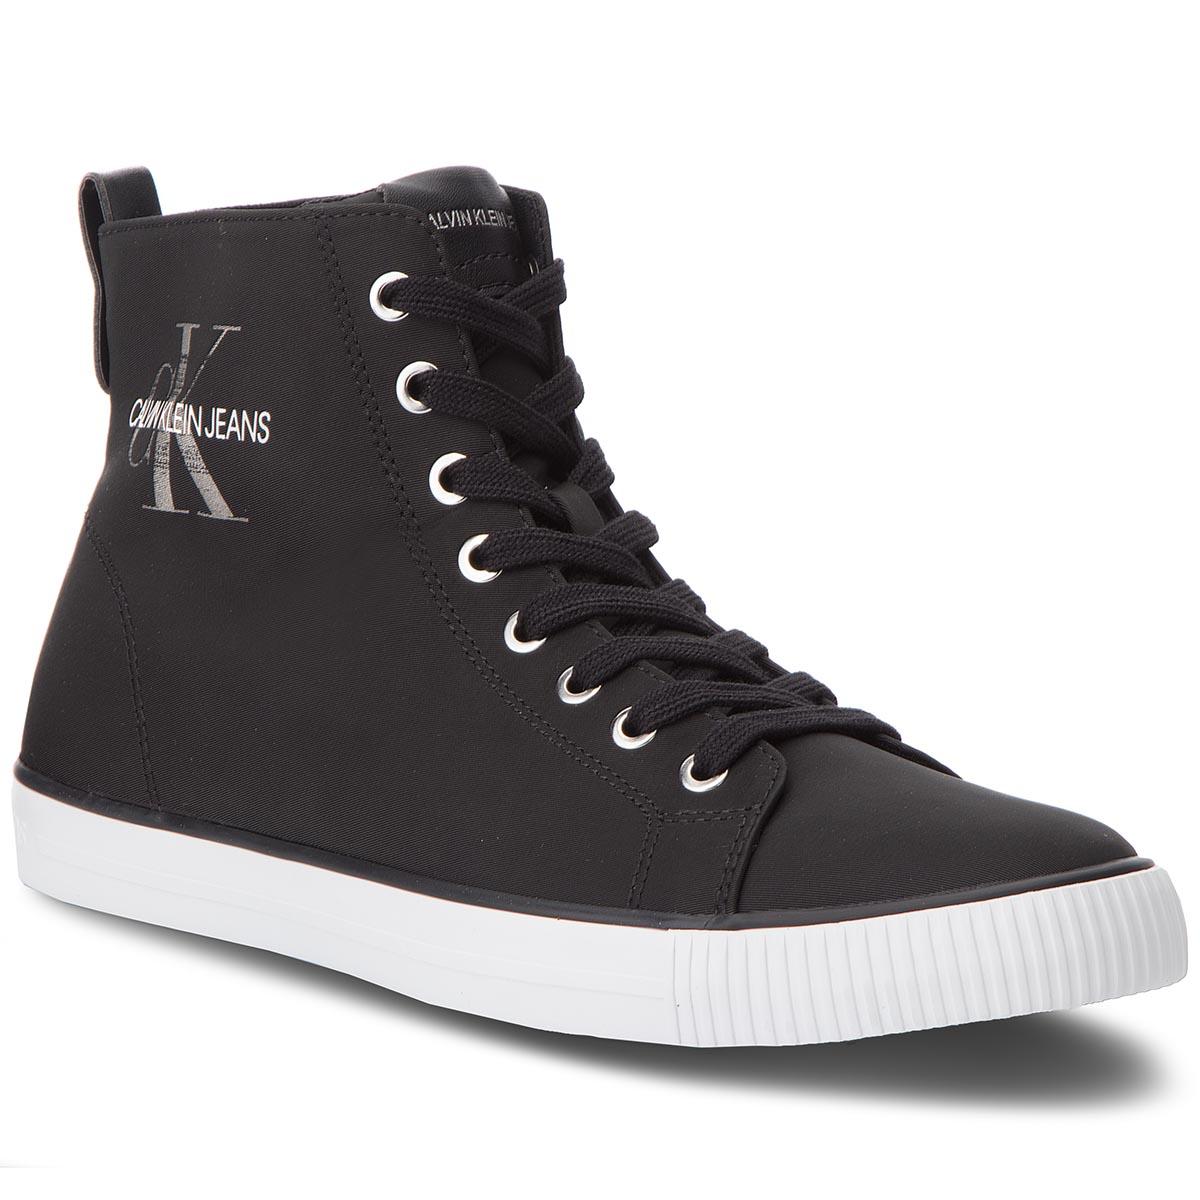 Image of Sneakers CALVIN KLEIN JEANS - Arthur SE8587 Black